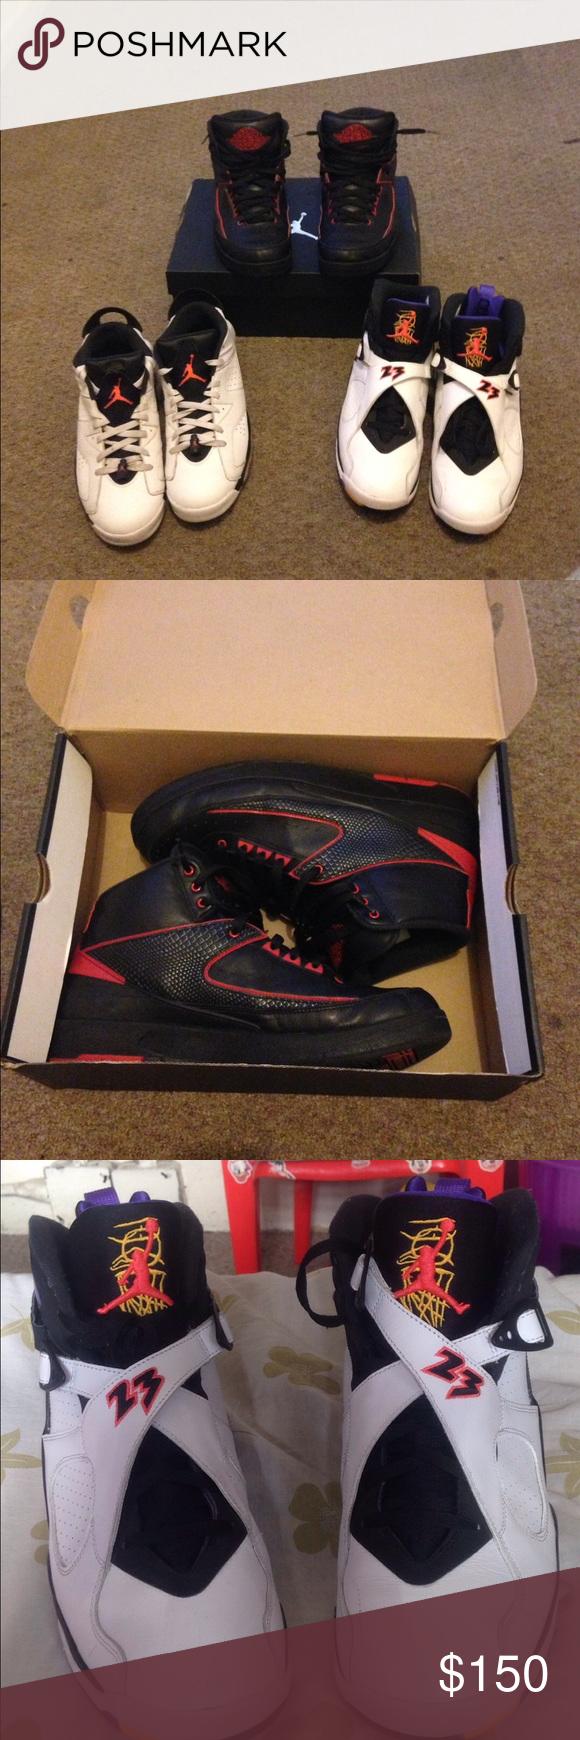 8,6,2 retro's Offer up Jordan Shoes Sneakers